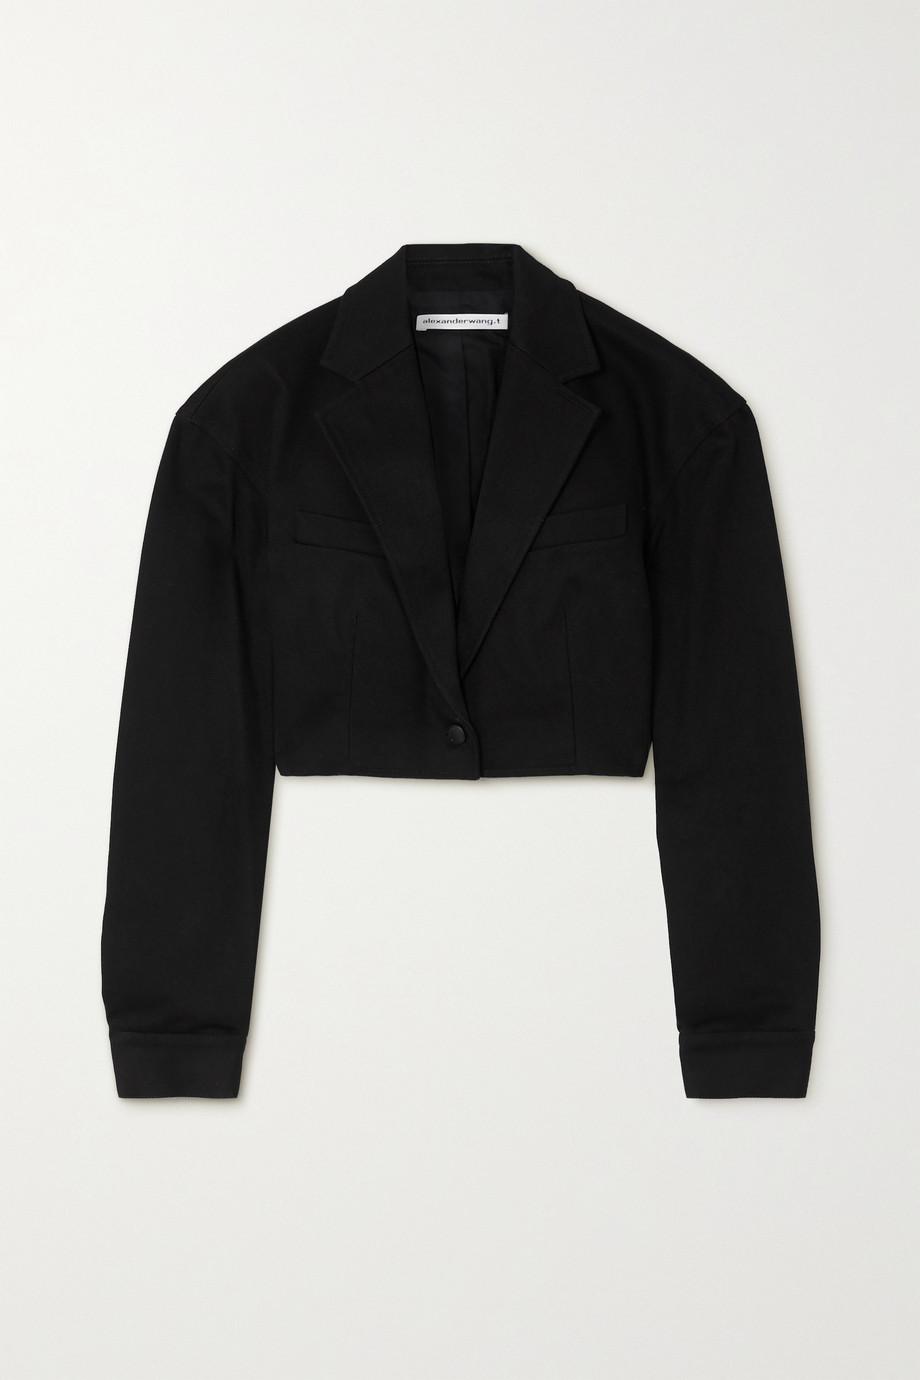 alexanderwang.t Cropped denim blazer